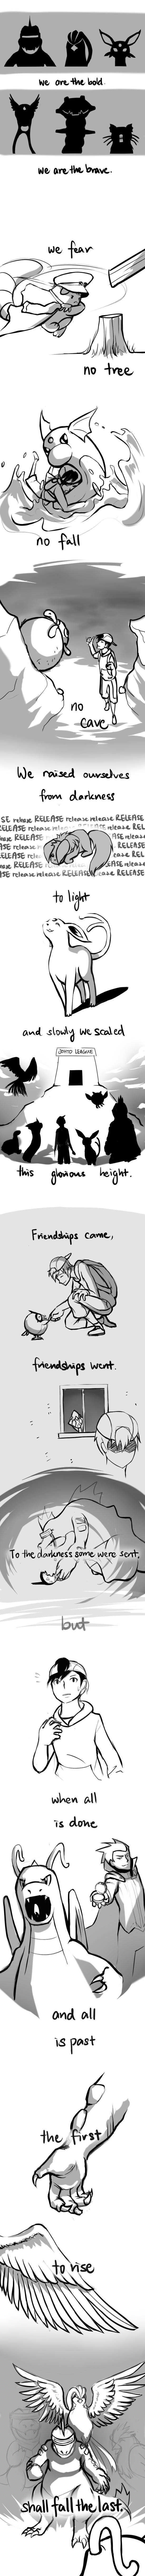 Pokemon Strength